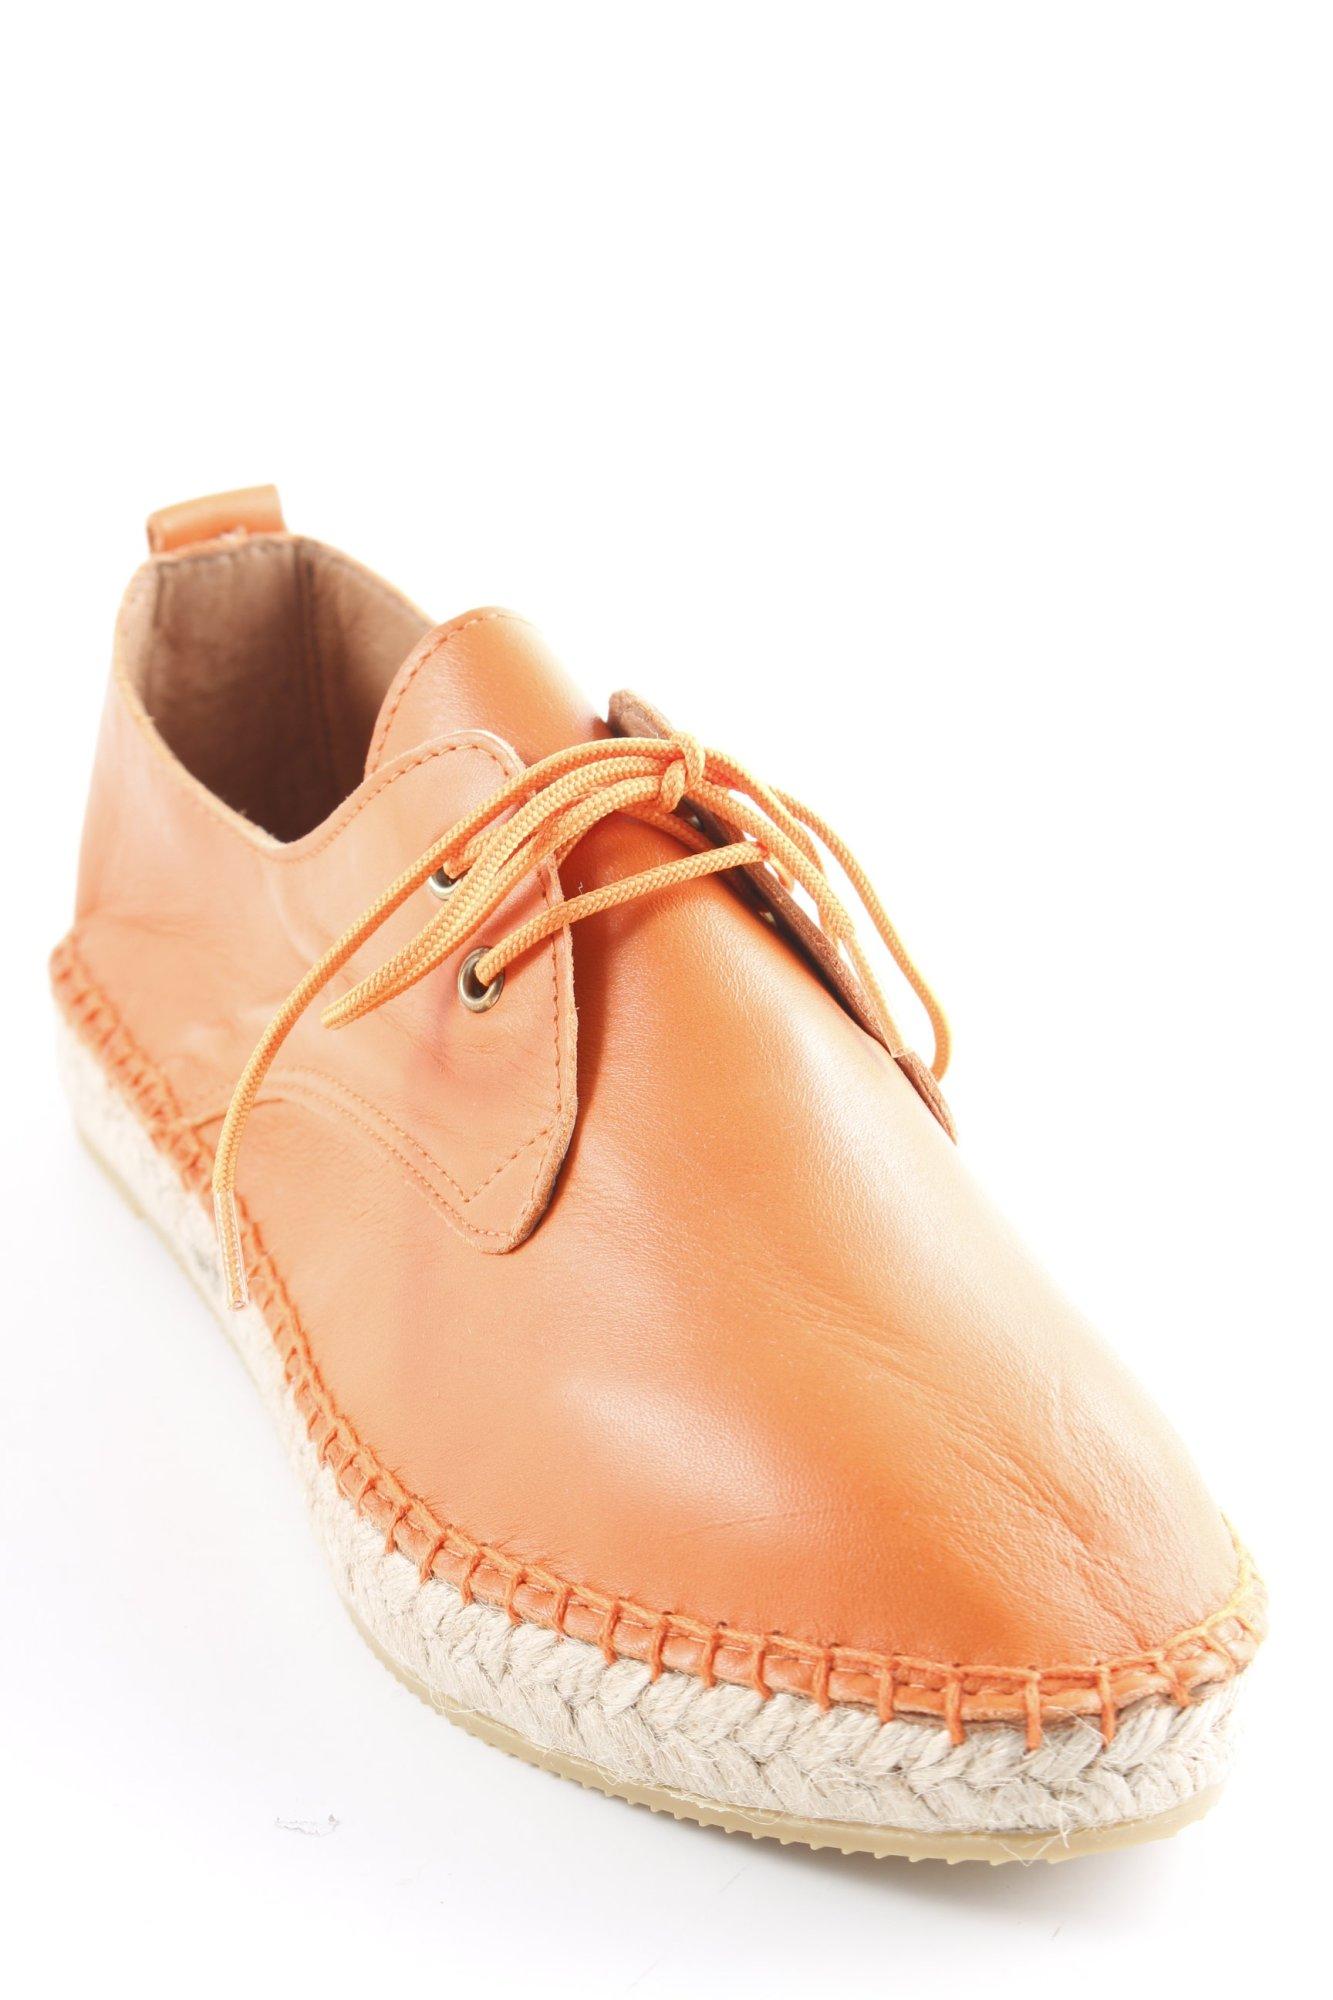 Act. Espadrilles-Sandales Orange Fluo Casual-Look Femmes Taille FR 40 sandals en cuir